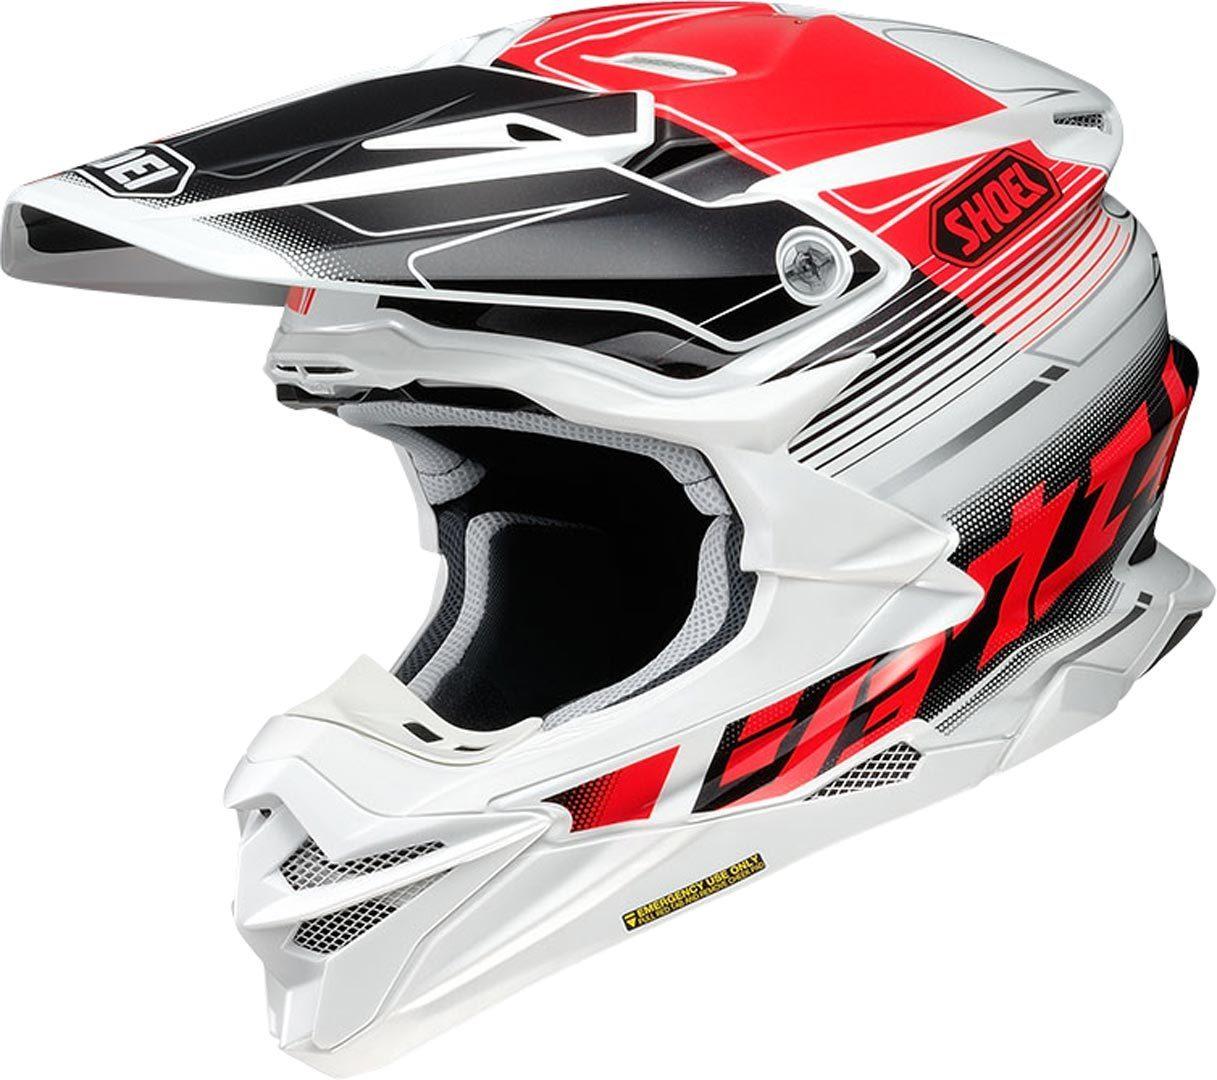 Shoei VFX-WR Zinger Helmet TC-1 Image